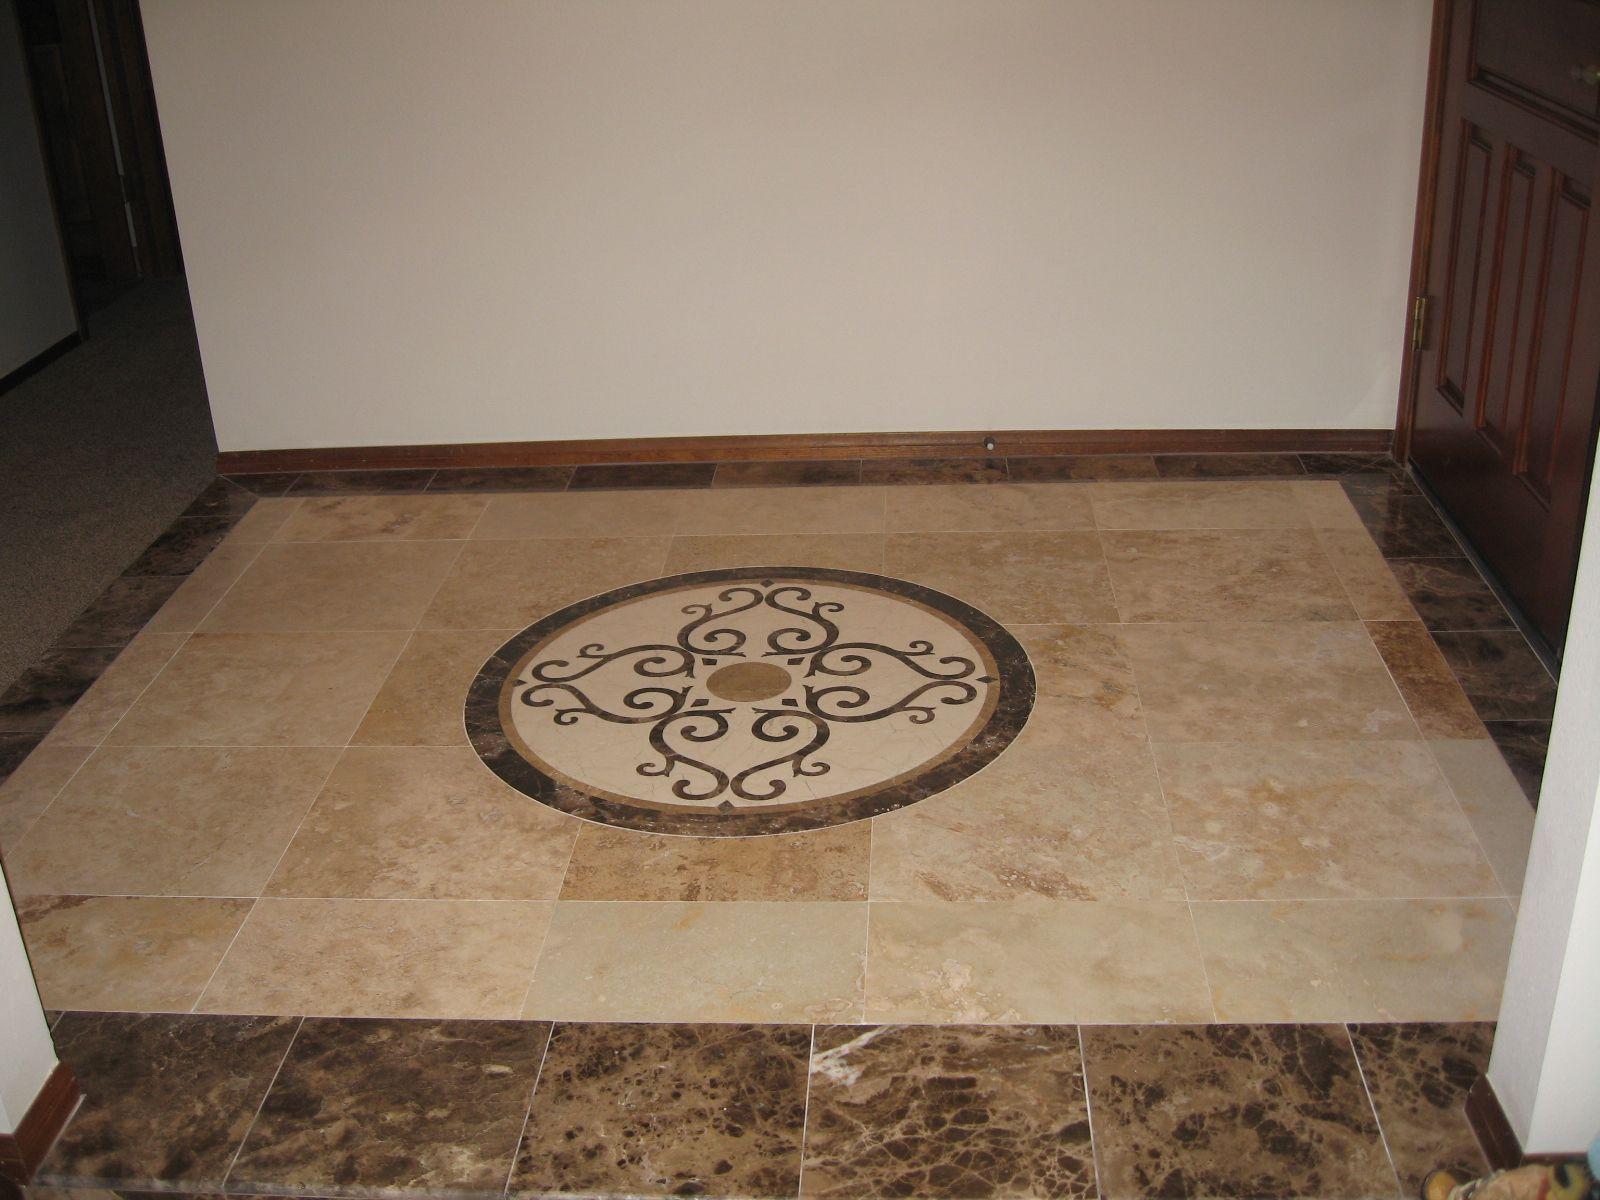 1 Mln Bathroom Tile Ideas Foyer Tile Ideas Patterned Floor